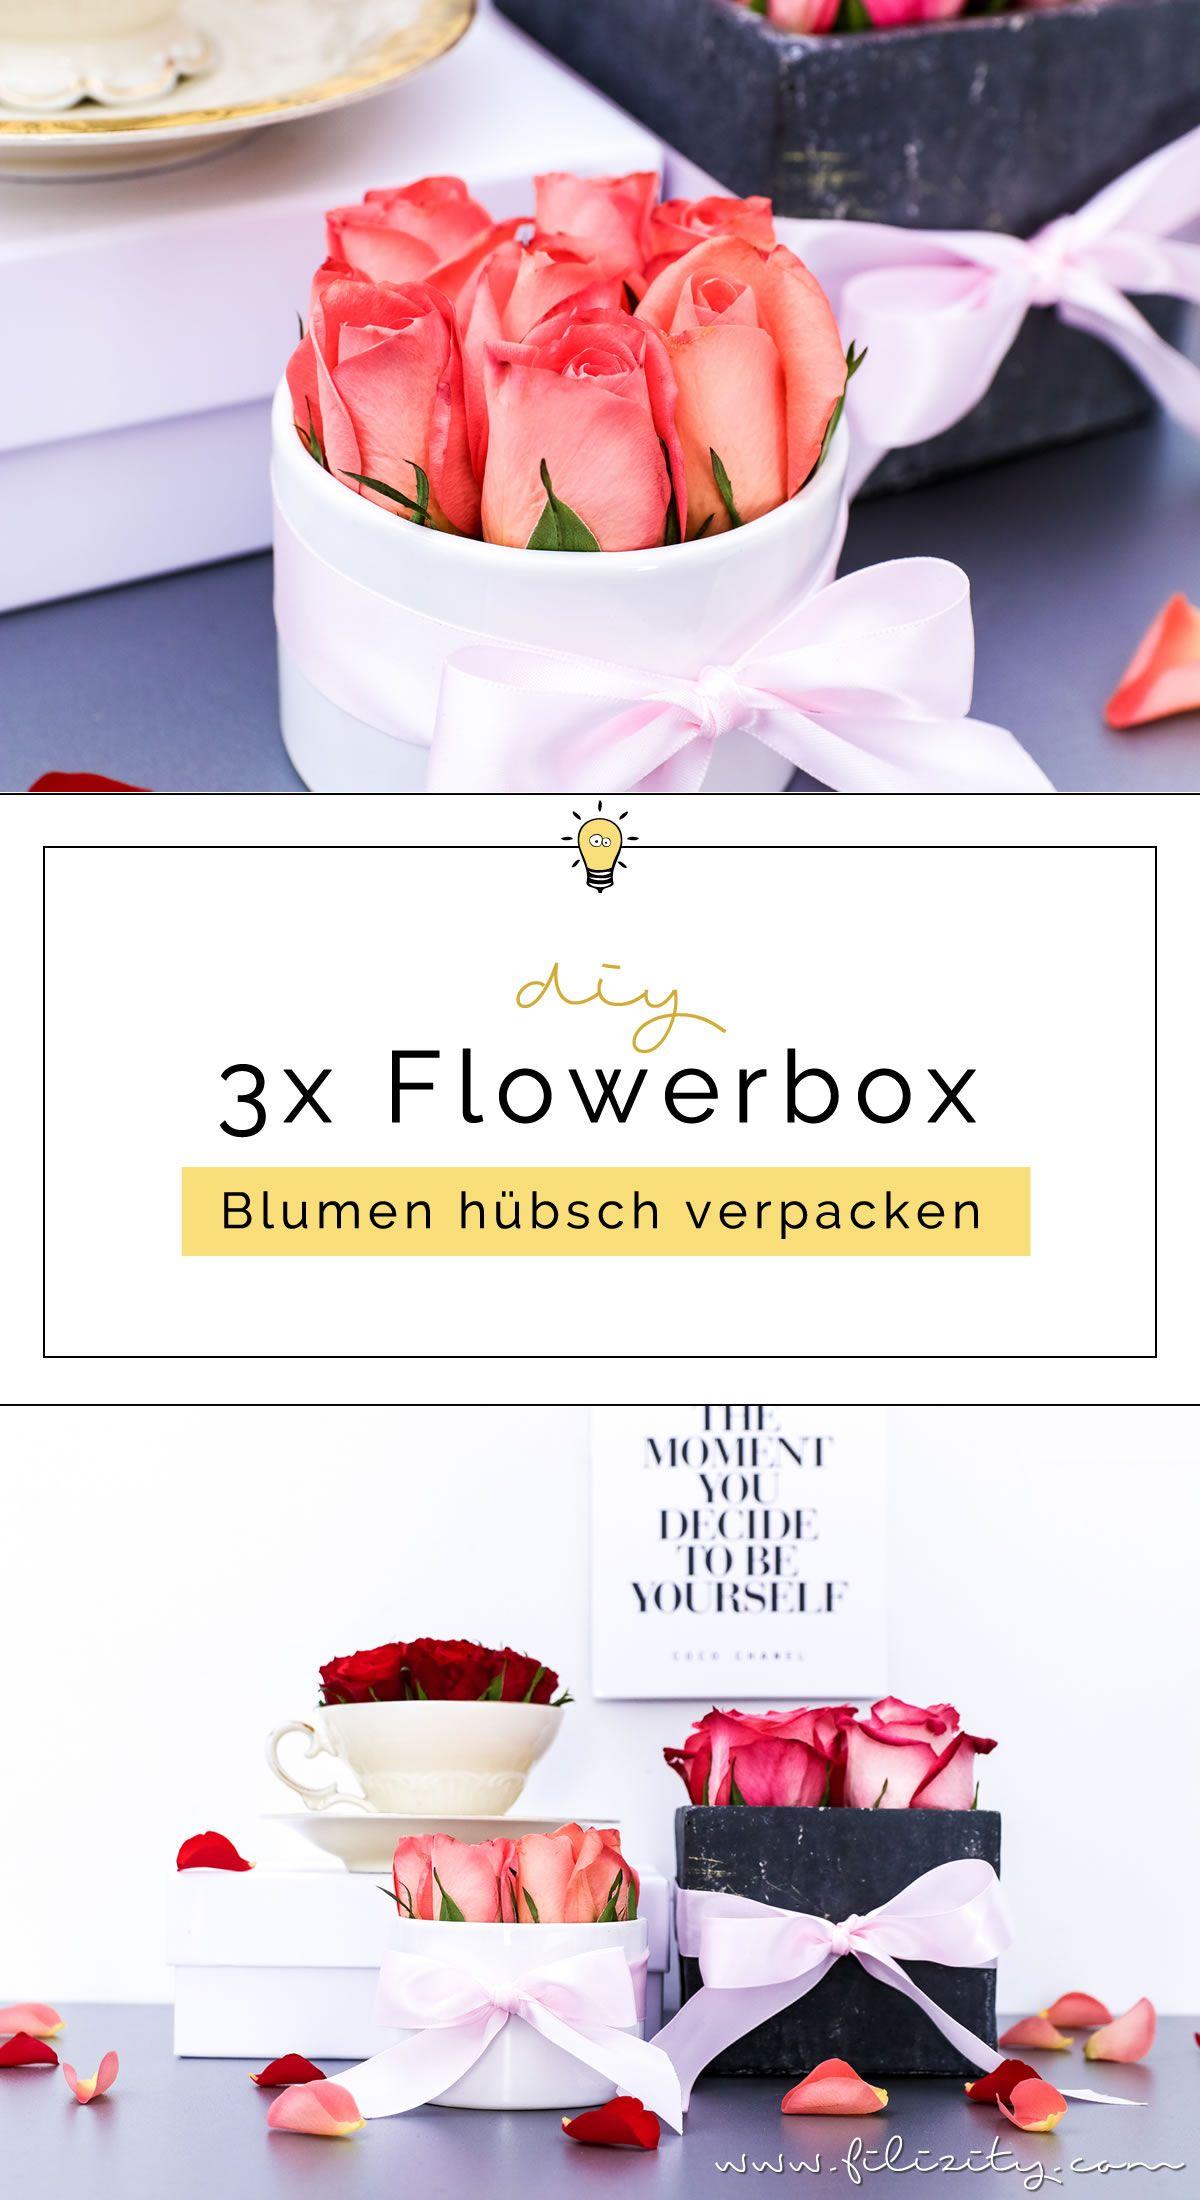 3x flowerbox selber machen diy geschenkidee deko deutsche blogger german bloggers d a ch. Black Bedroom Furniture Sets. Home Design Ideas